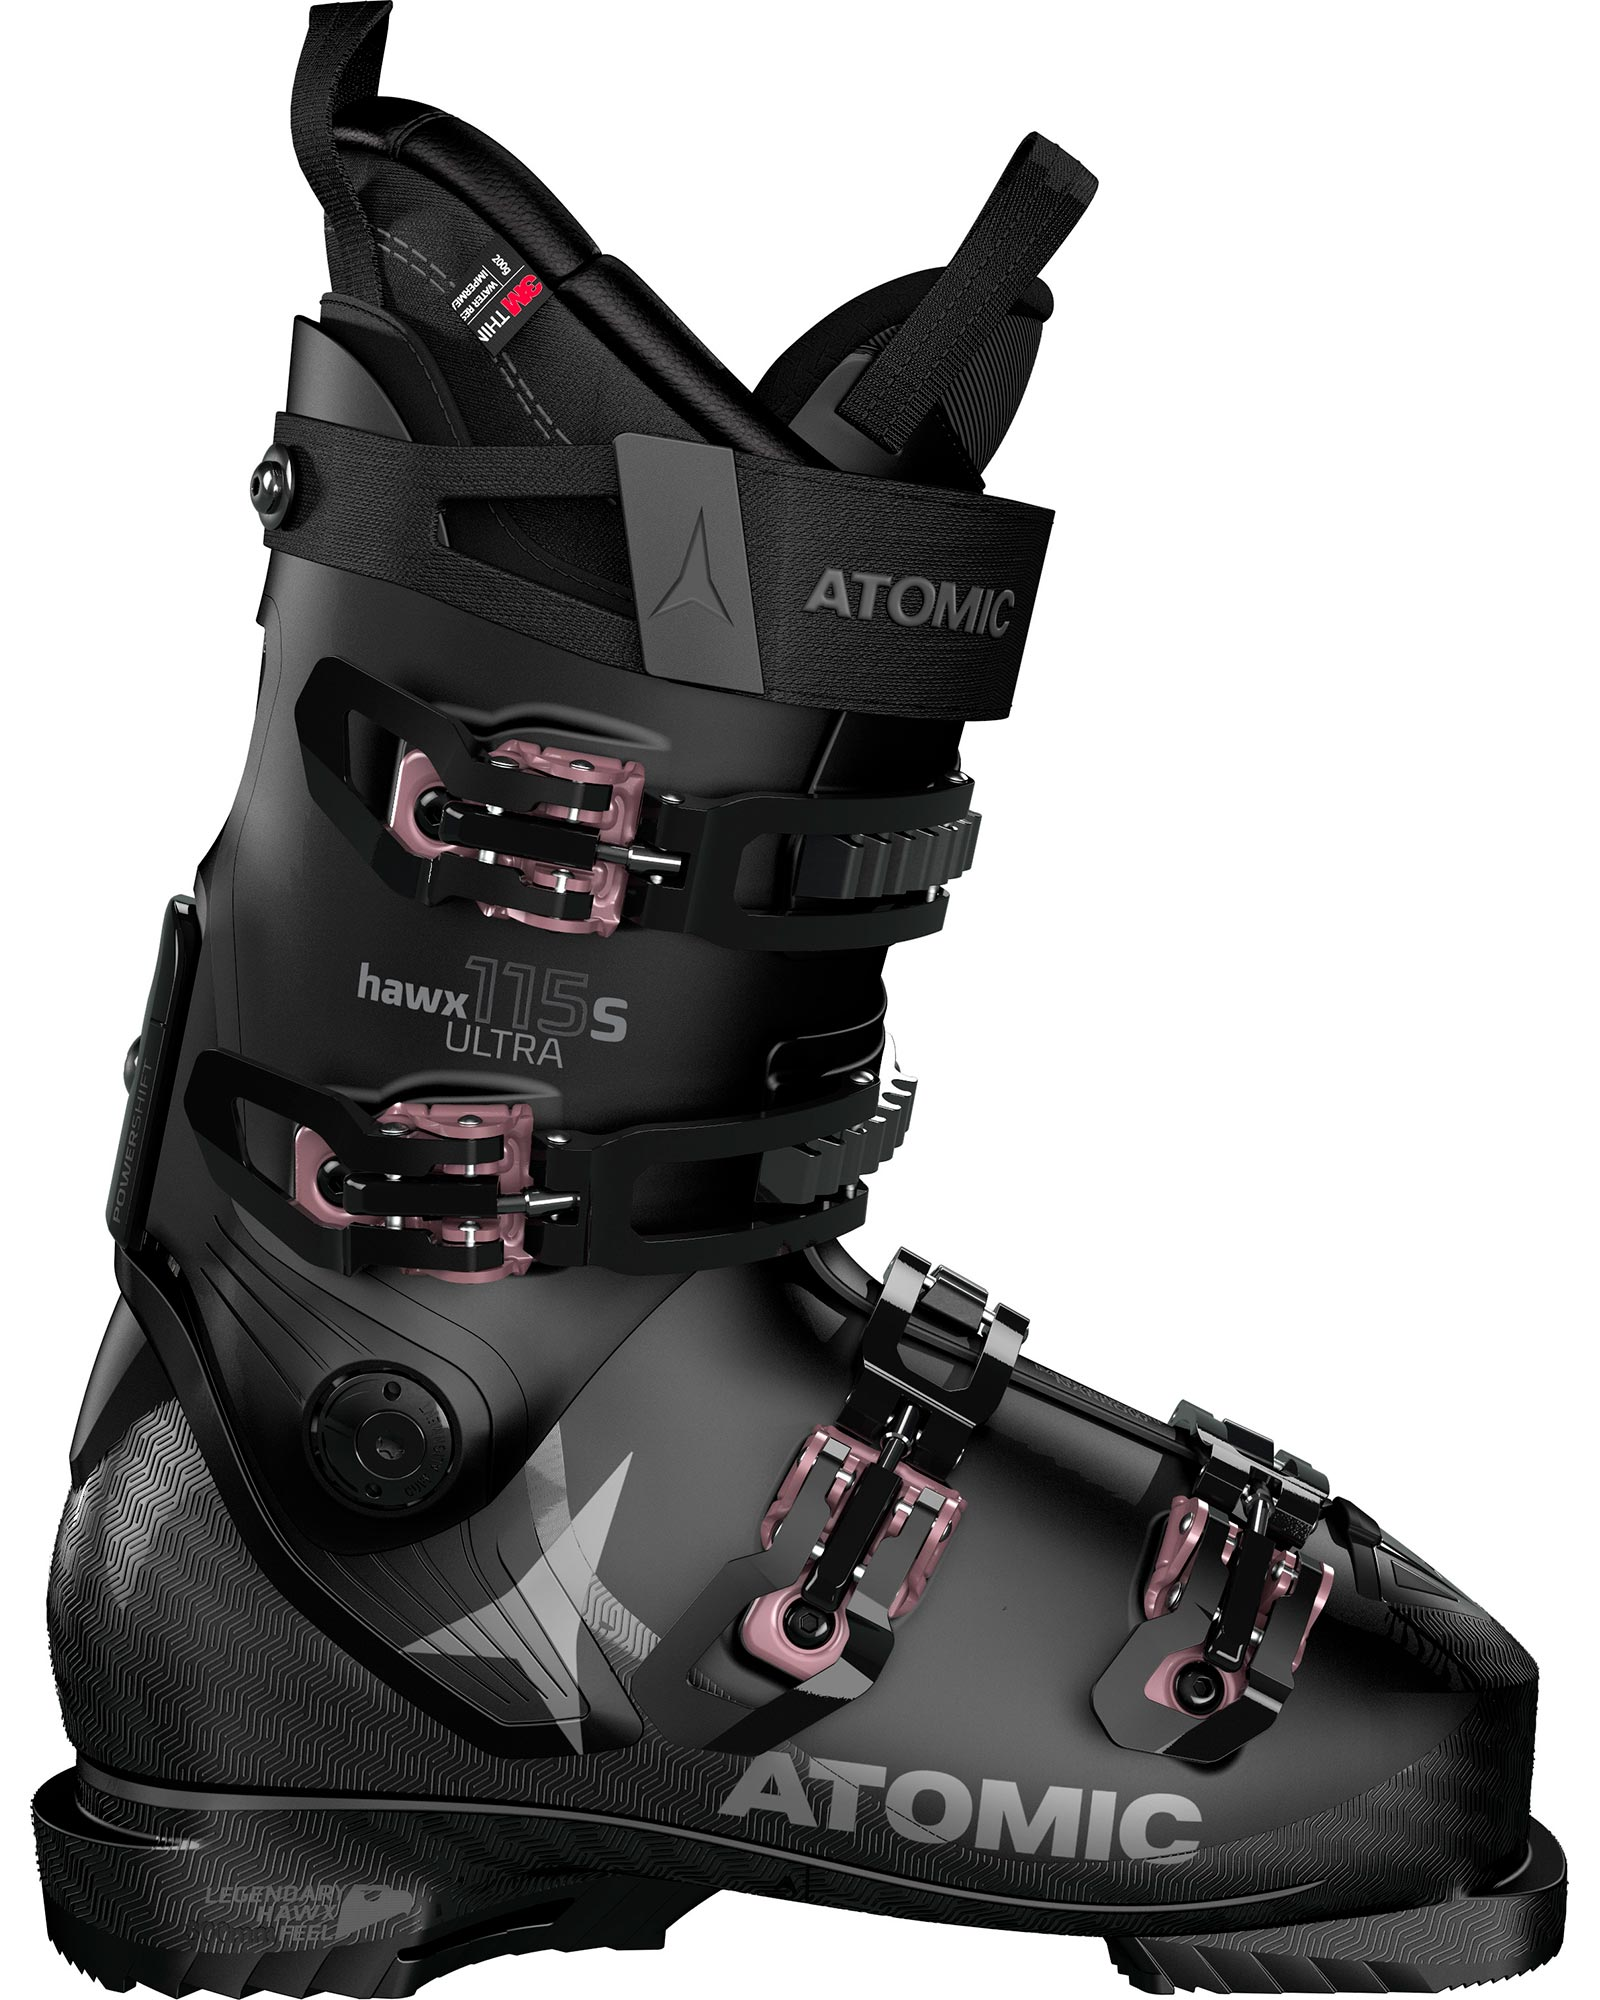 Atomic Women's Hawx Ultra 115 S W Ski Boots 2020 / 2021 0